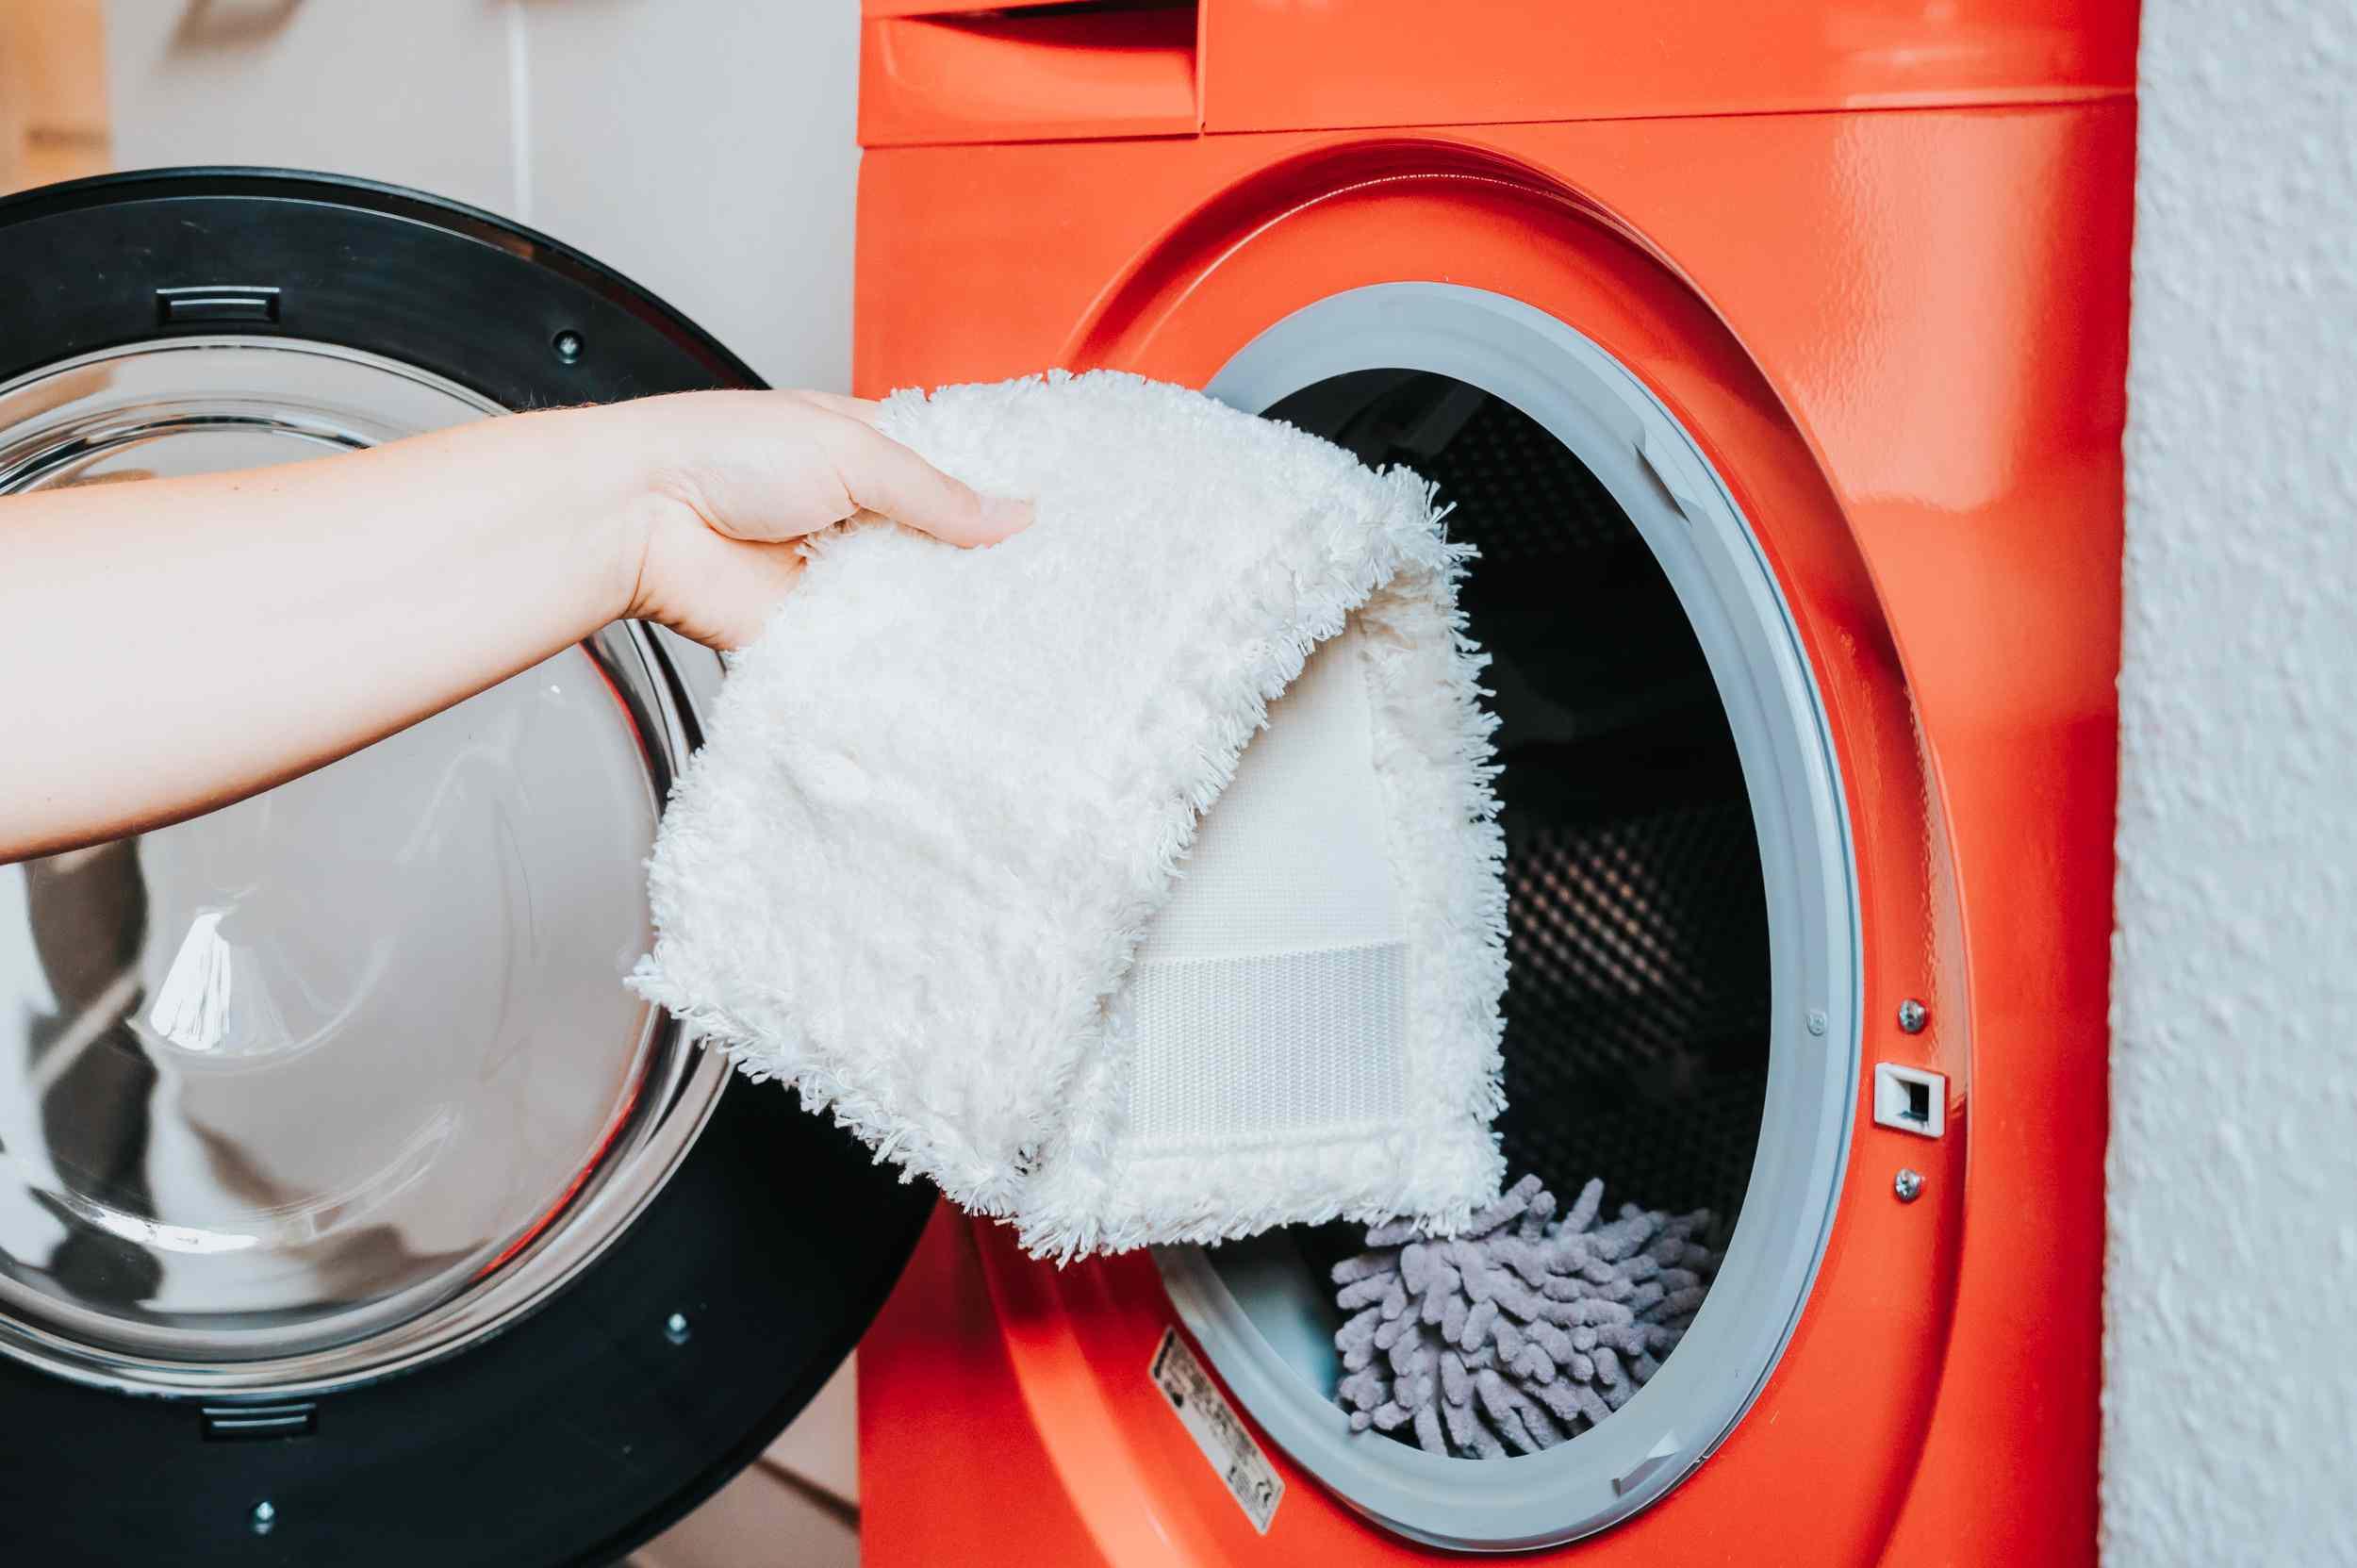 Removable white cotton mop head tossed in orange washing machine